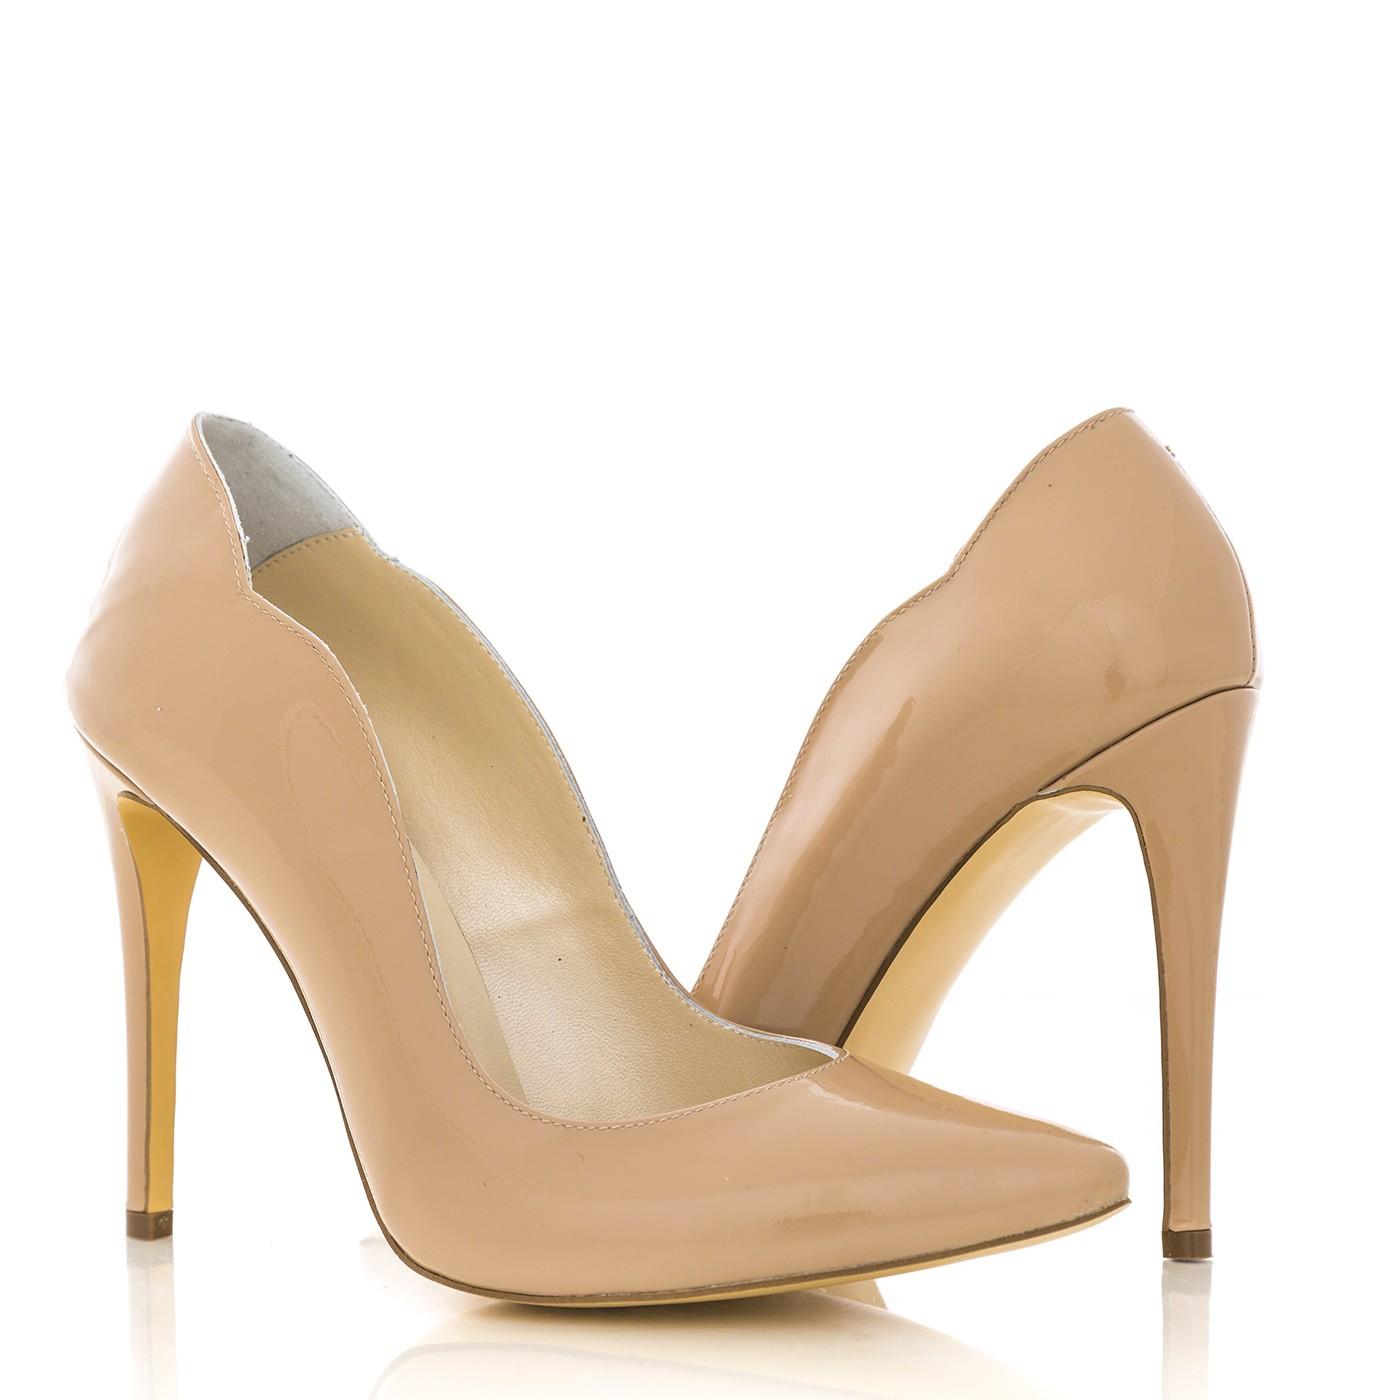 Pantofi stiletto din piele naturala 1501 kiko nude CONDUR